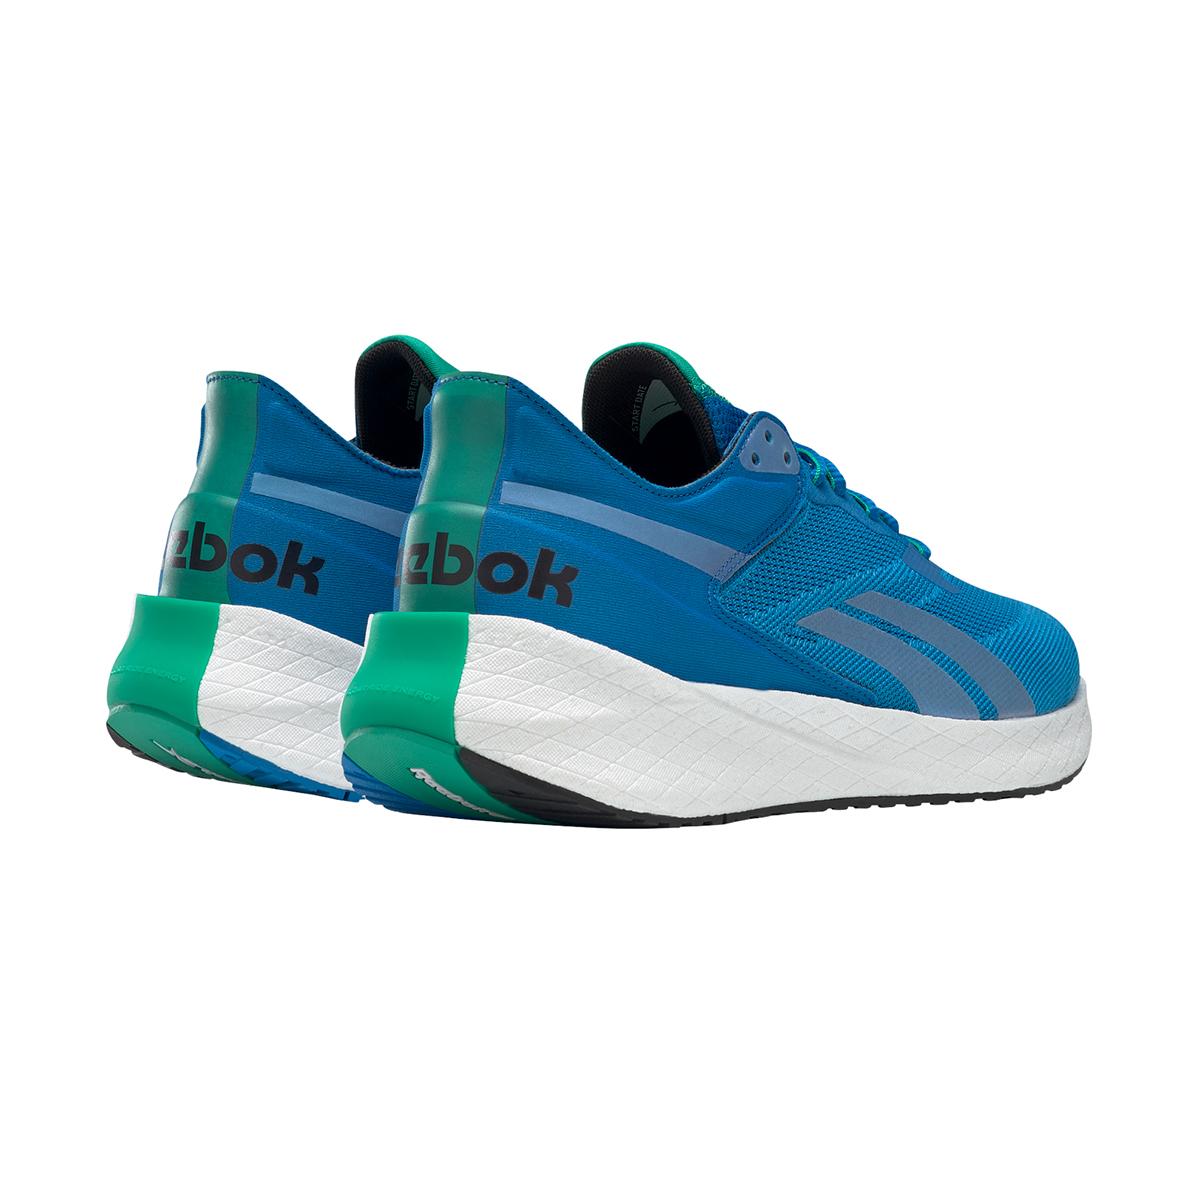 Men's Reebok Floatride Energy Symmetros Running Shoe - Color: Dynamic Blue/Horizon Blue/Court Green - Size: 7 - Width: Regular, Dynamic Blue/Horizon Blue/Court Green, large, image 4